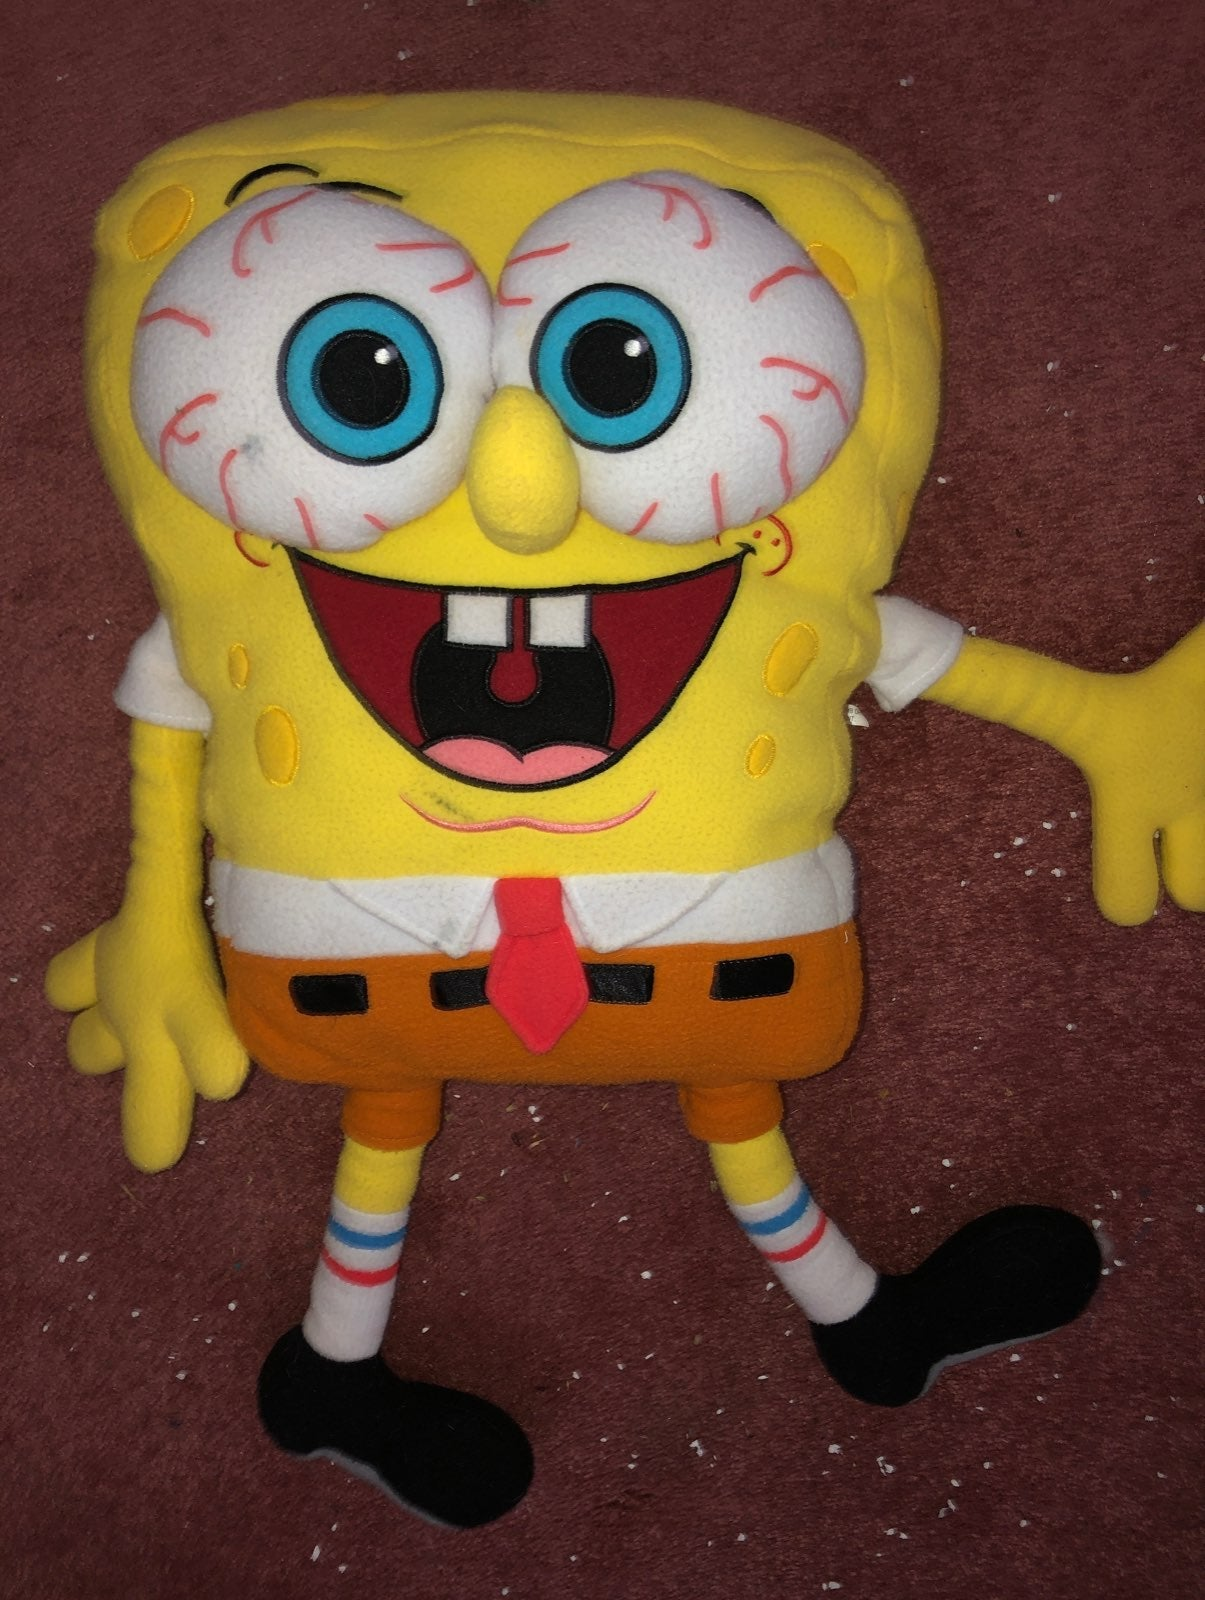 Giant Spongebob Squarepants